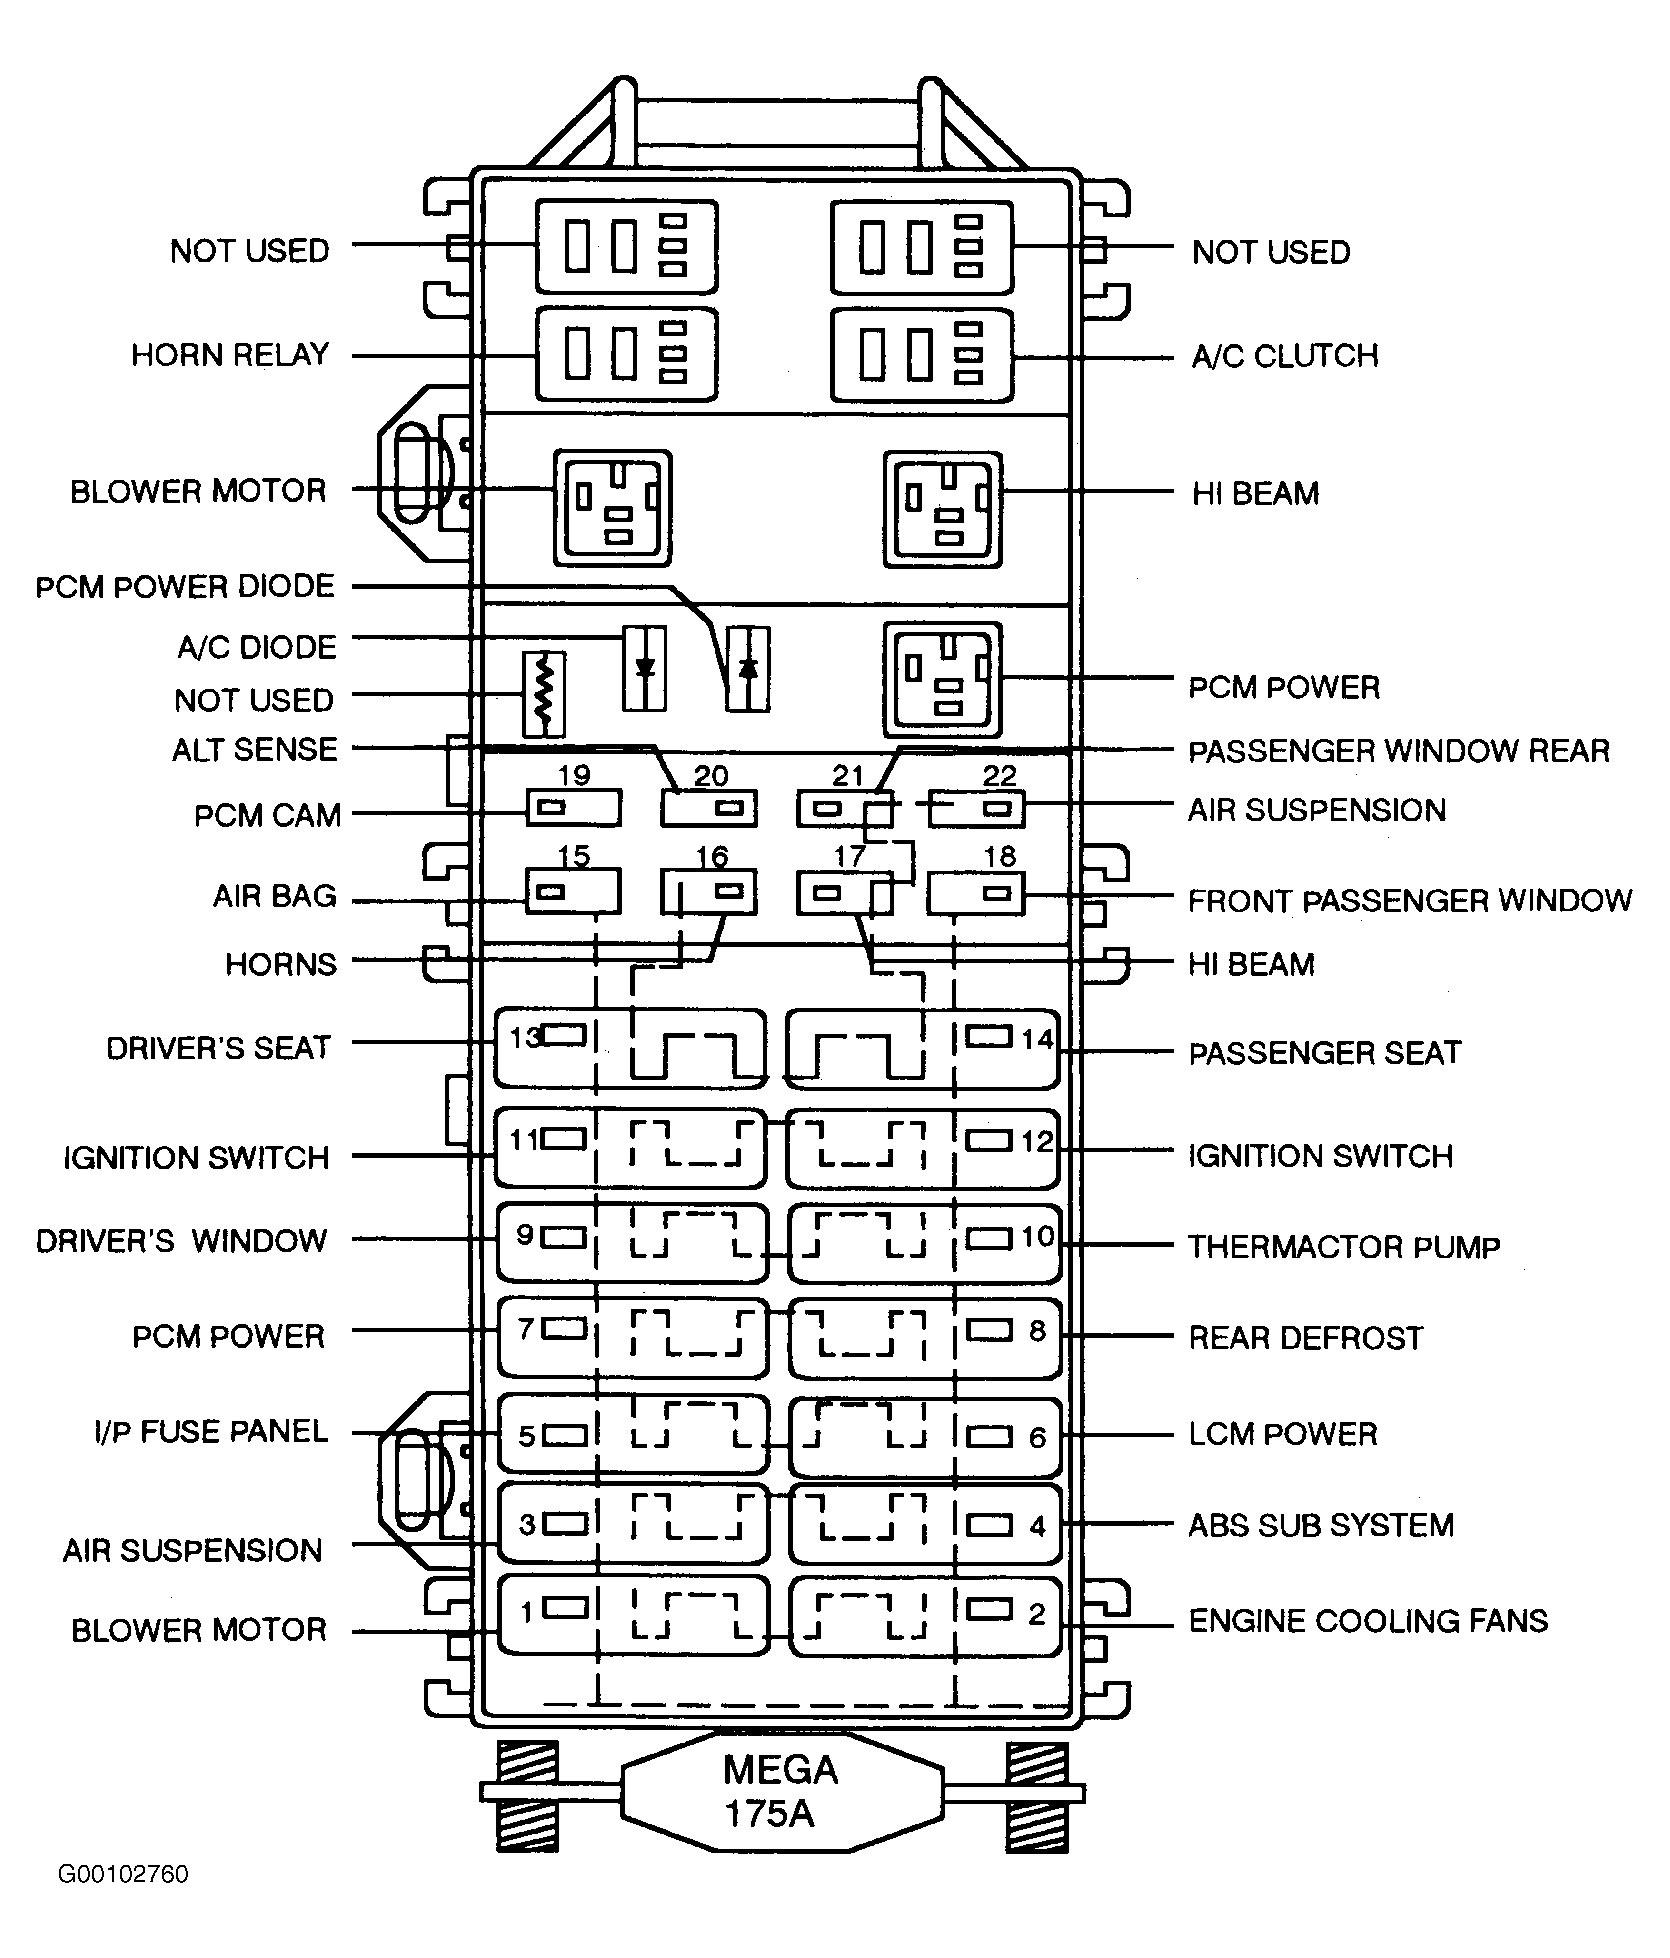 fuse box on 2003 lincoln aviator